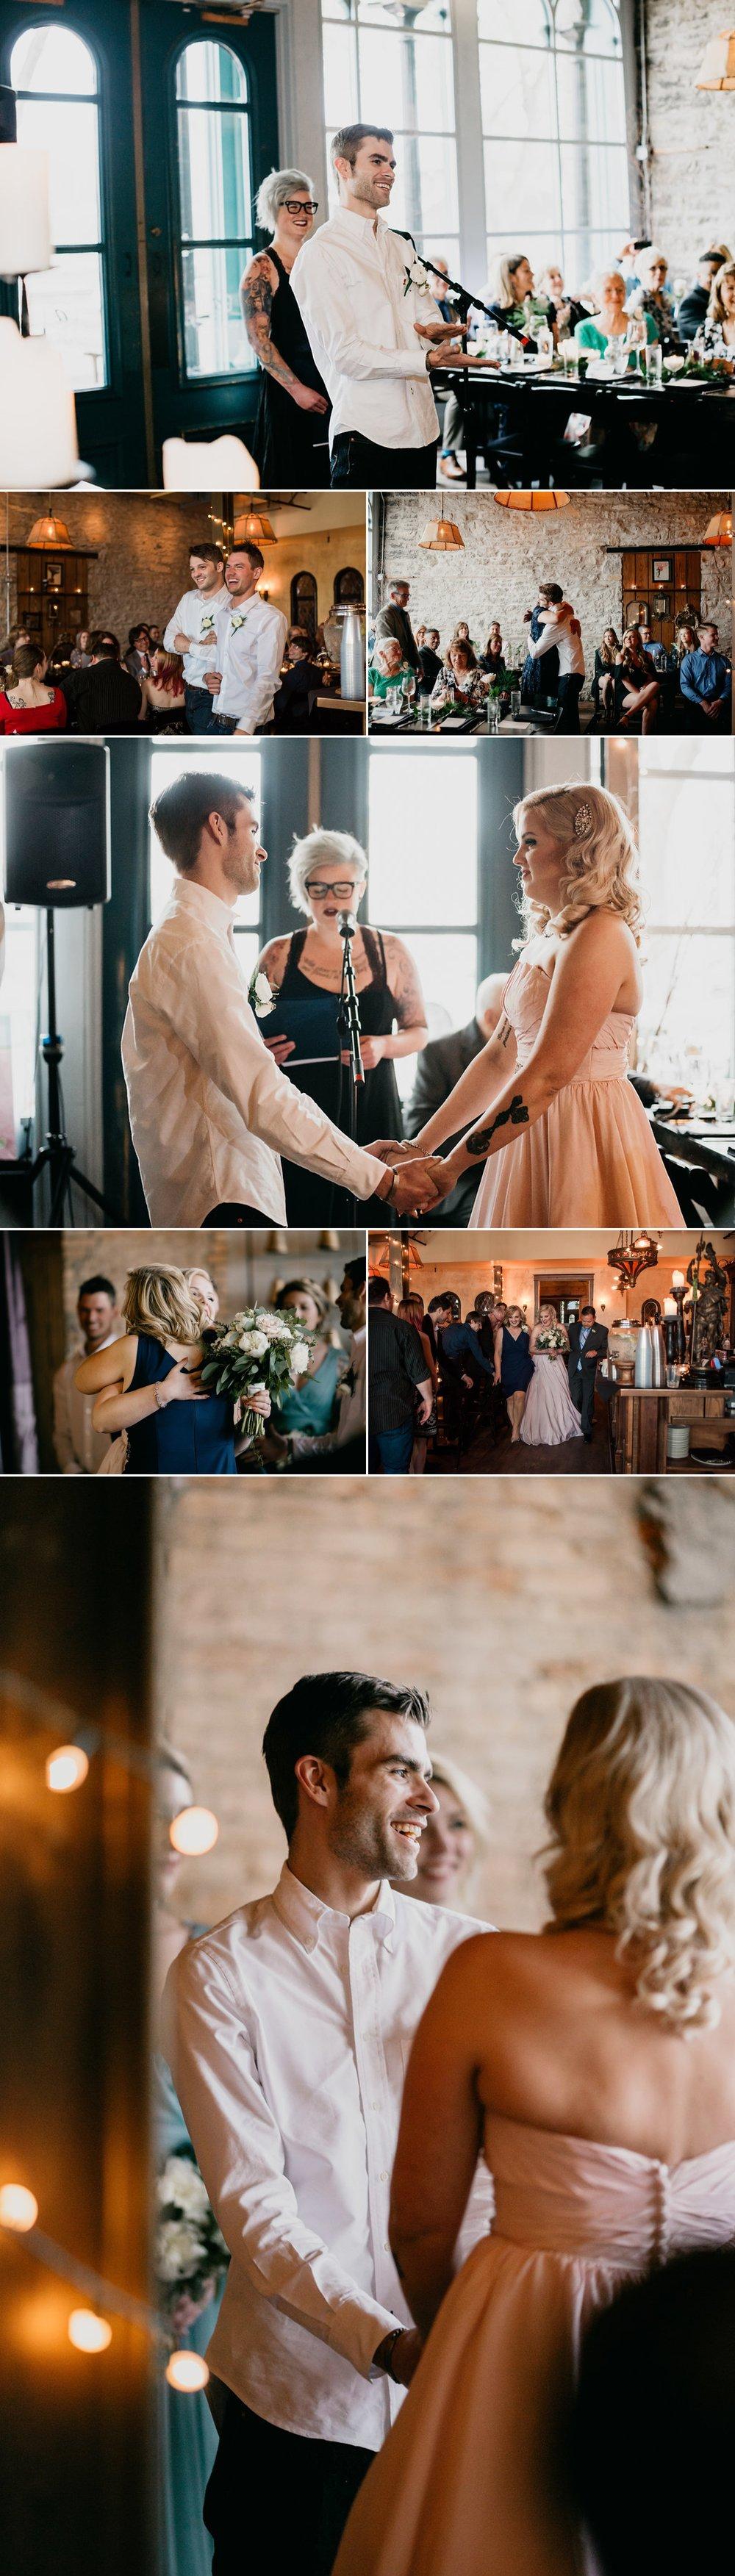 Minnesota Wedding Photographer 5.jpg